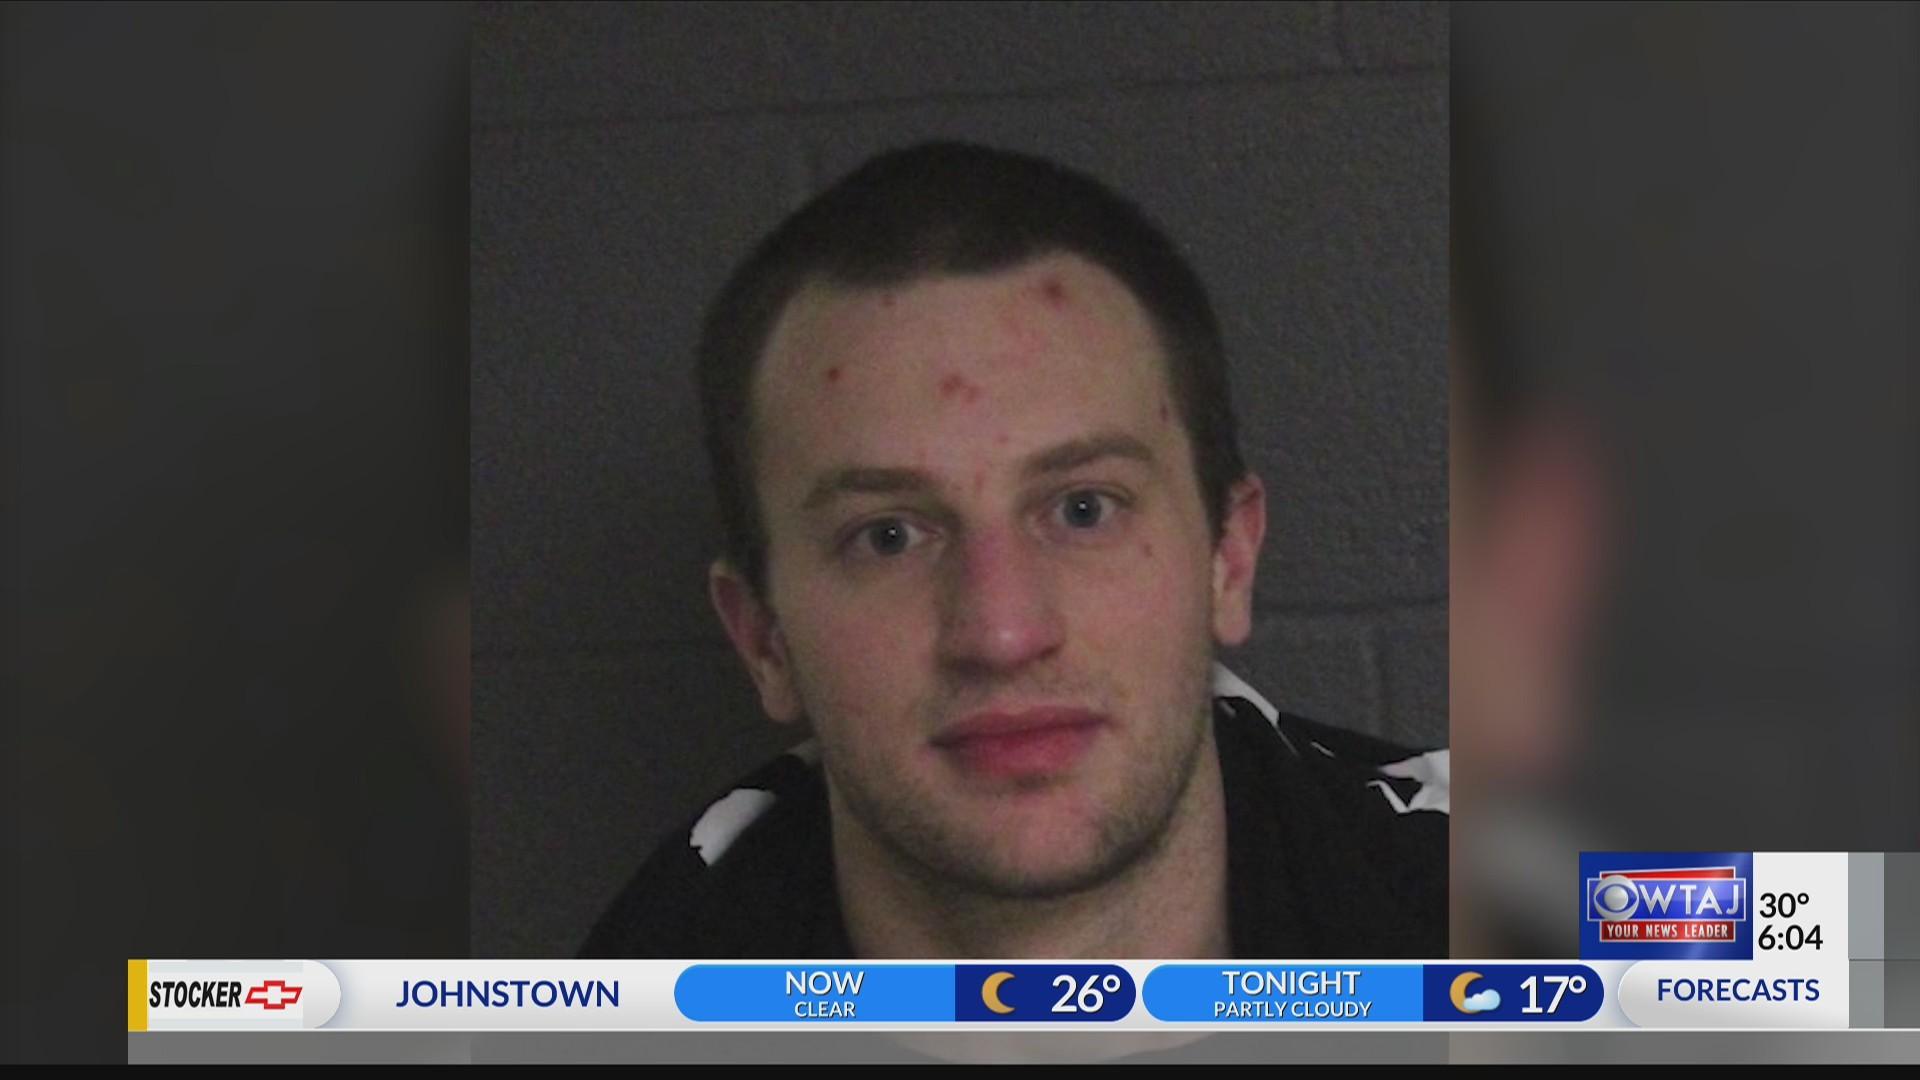 Two_men_arrested_after_near_fatal_overdo_0_20190115005608